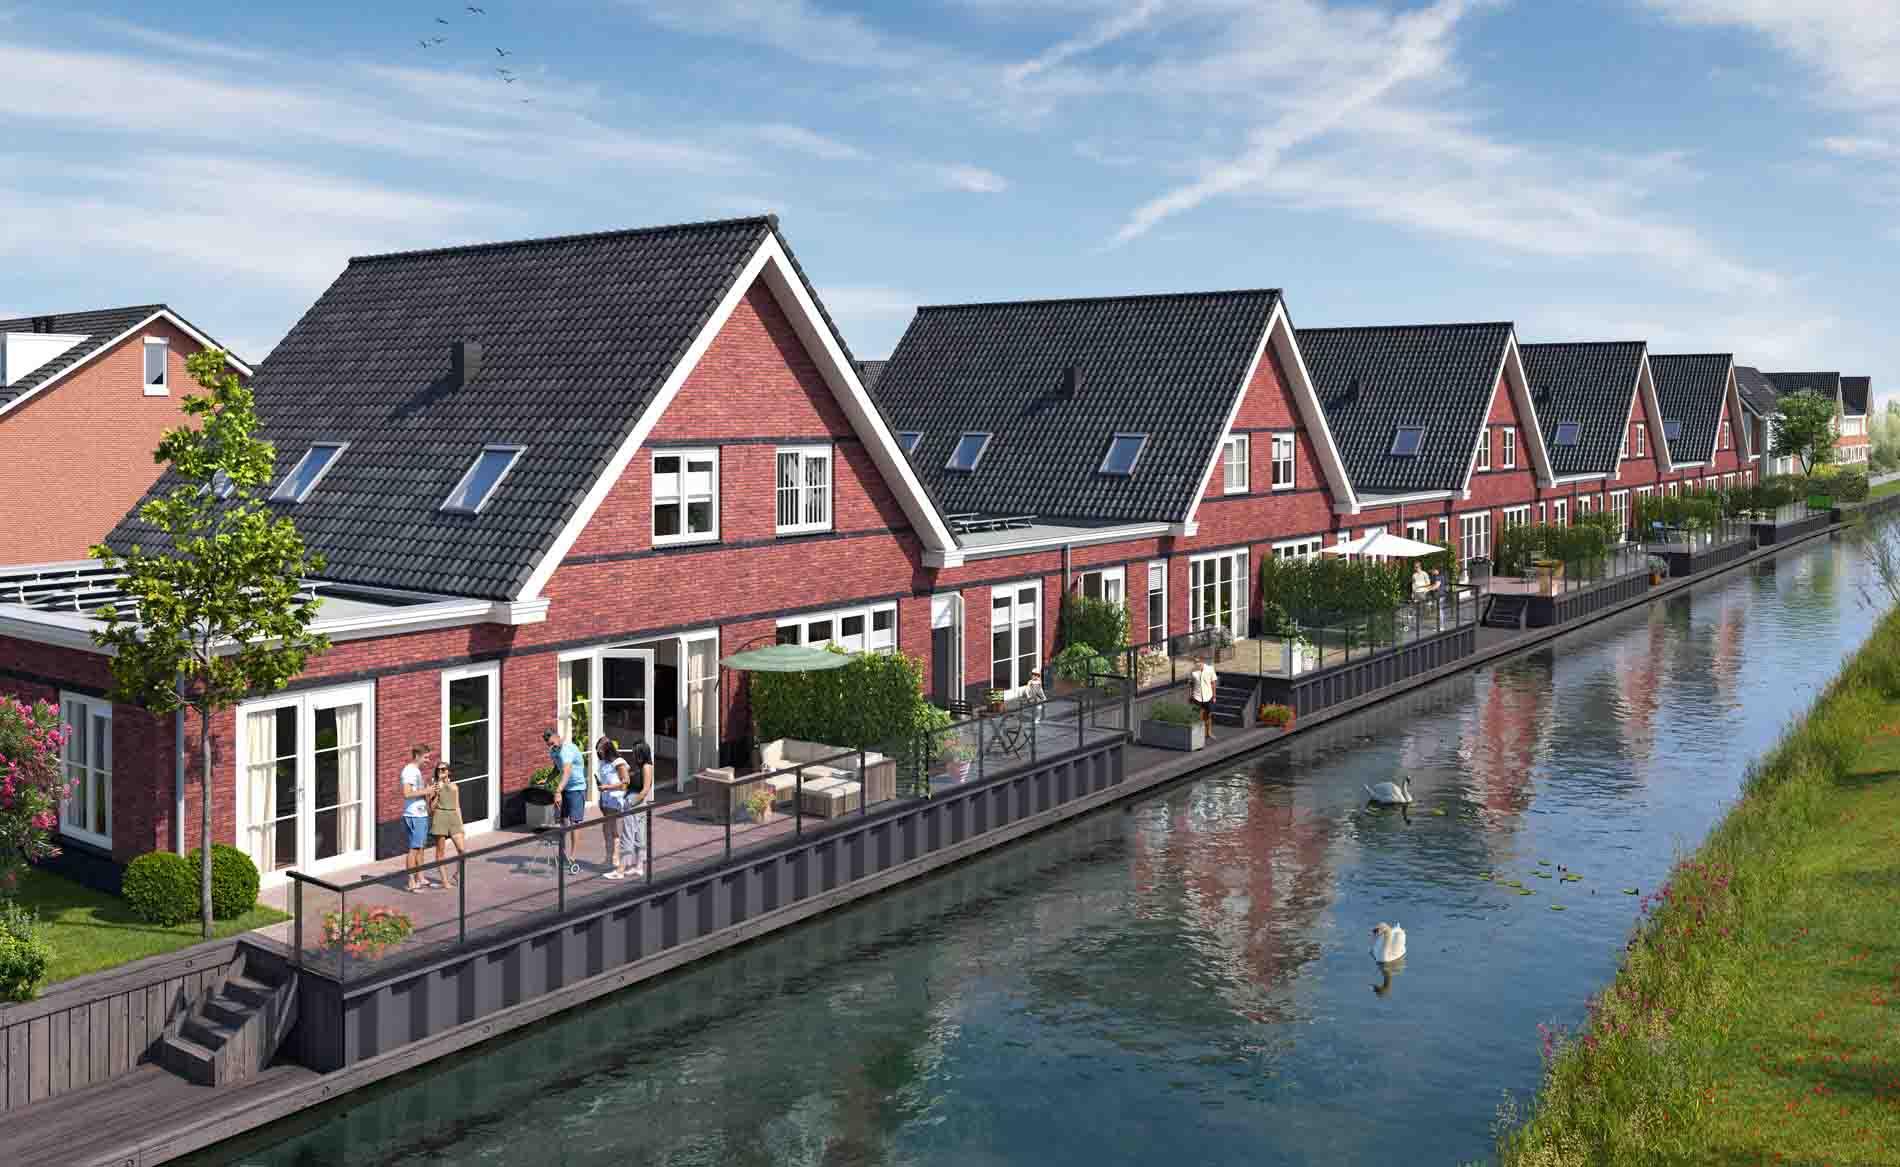 architect woningen woningbouw jaren '30 architectuur nieuwbouwwijk Regentes Uithoorn Thamerweg BBHD architecten